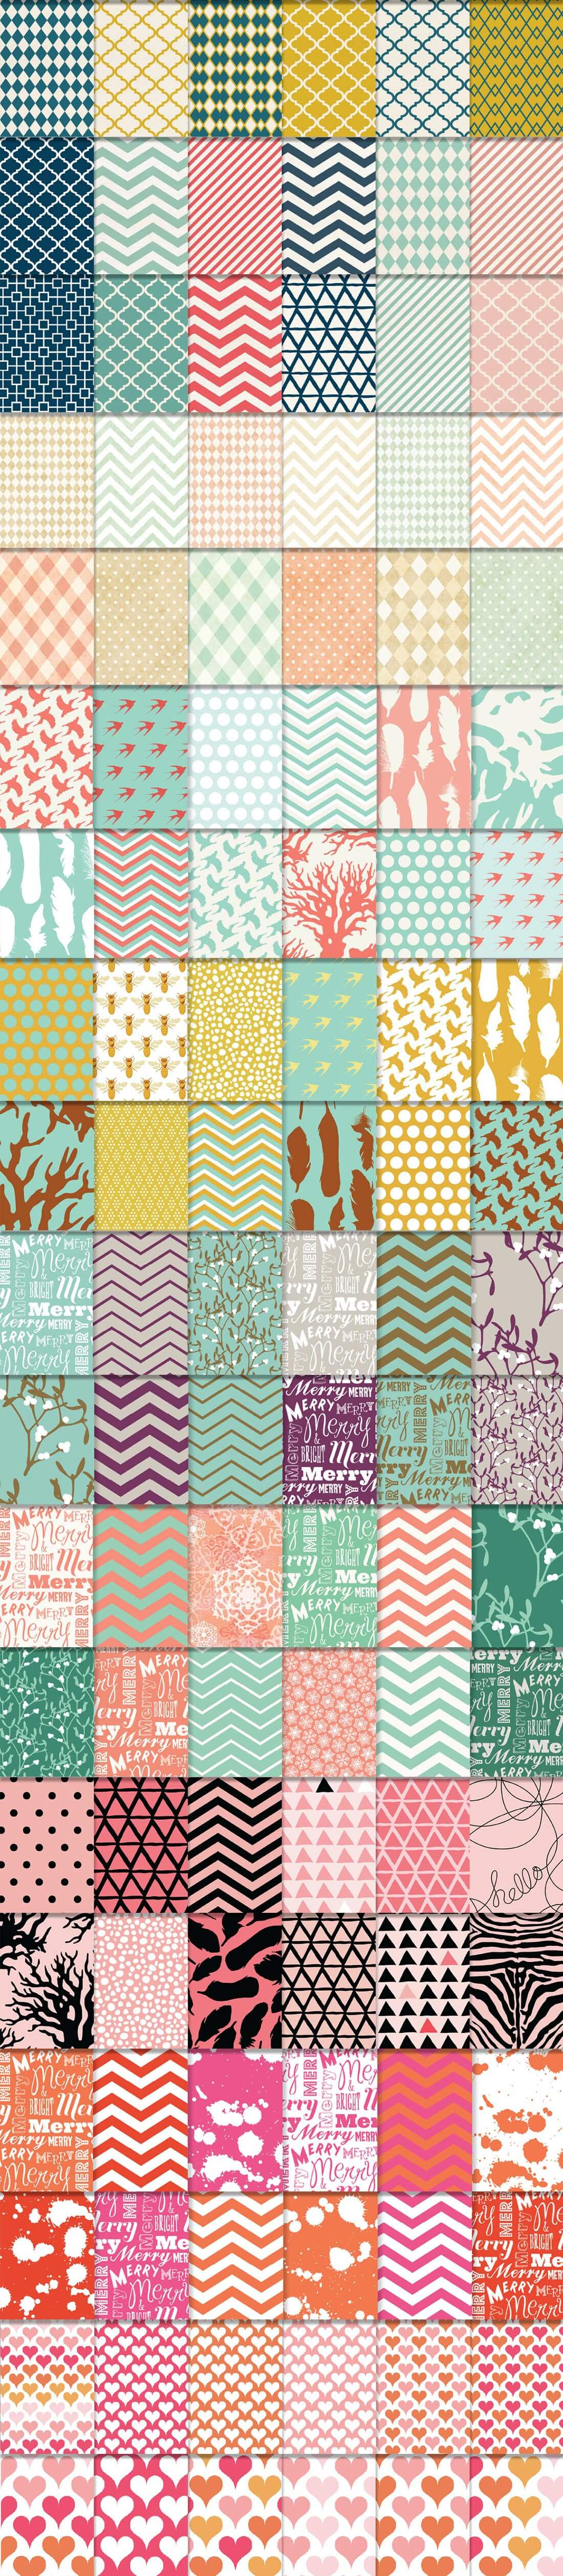 540 Geometric Patterns Super Bundle from Blixa 6 Studios - Blixa6Studios 6